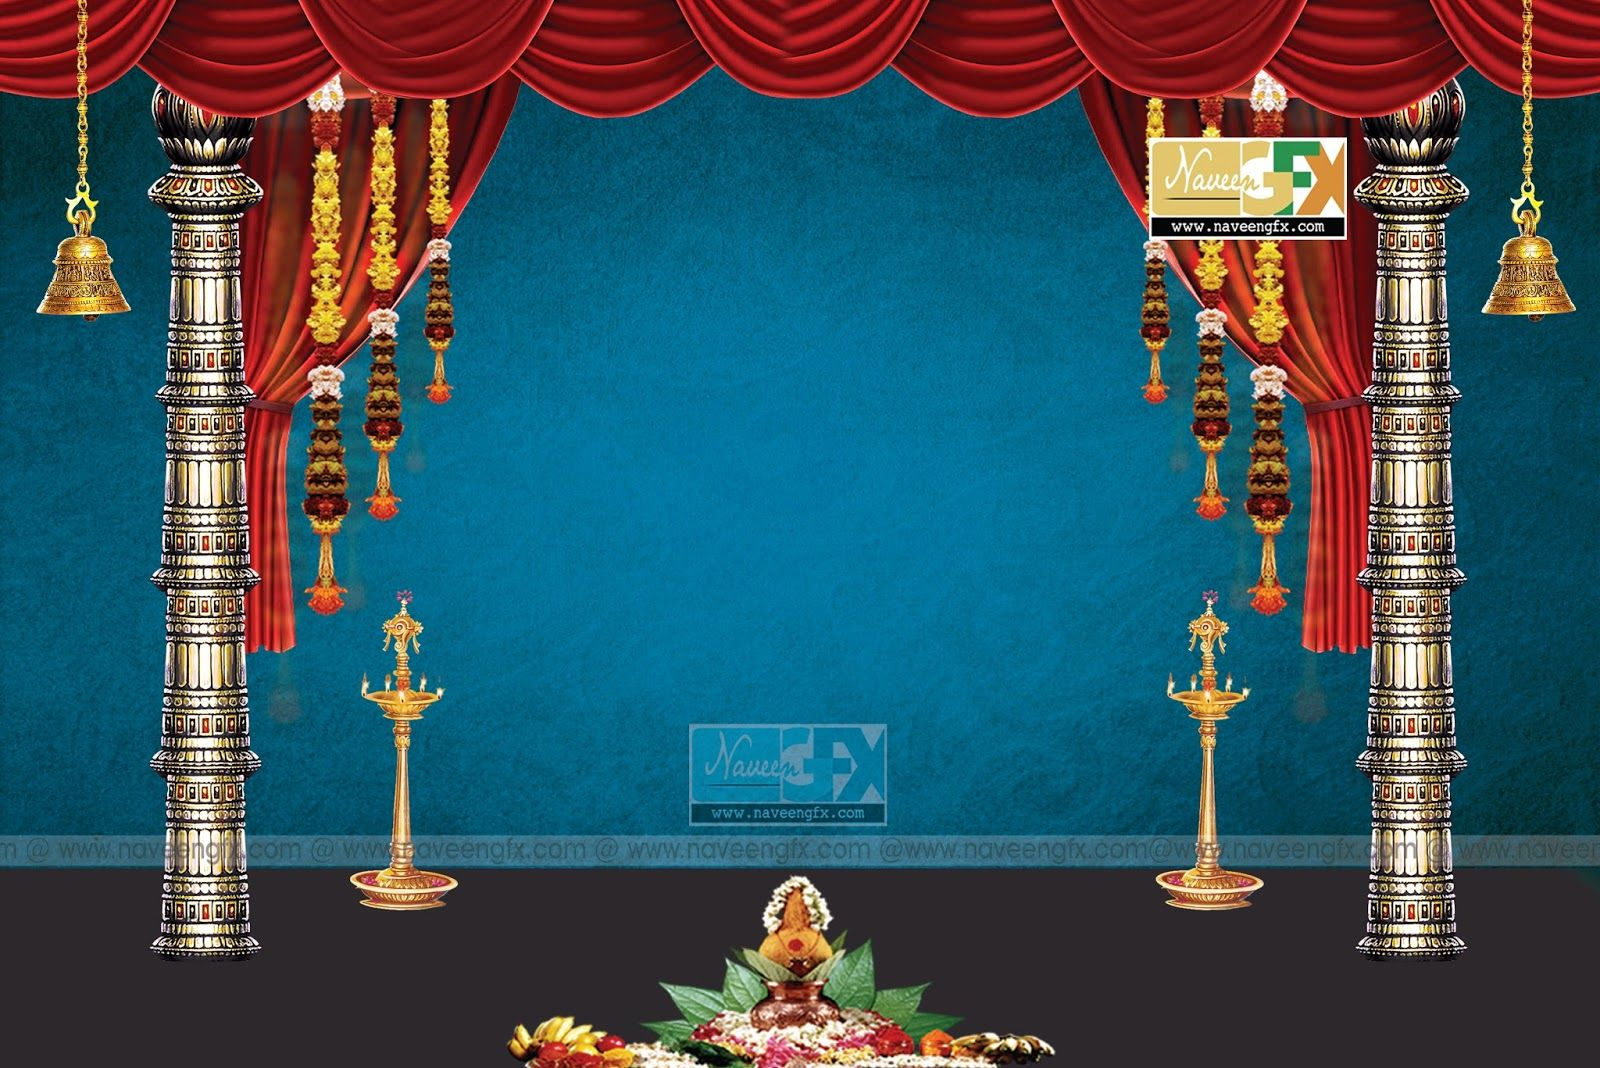 Stage Backdrop Ideas For Vinayaka Chaturthi And Durga Navaratri Festival Stage Wedding Background Wallpaper Photoshop Backgrounds Photoshop Design